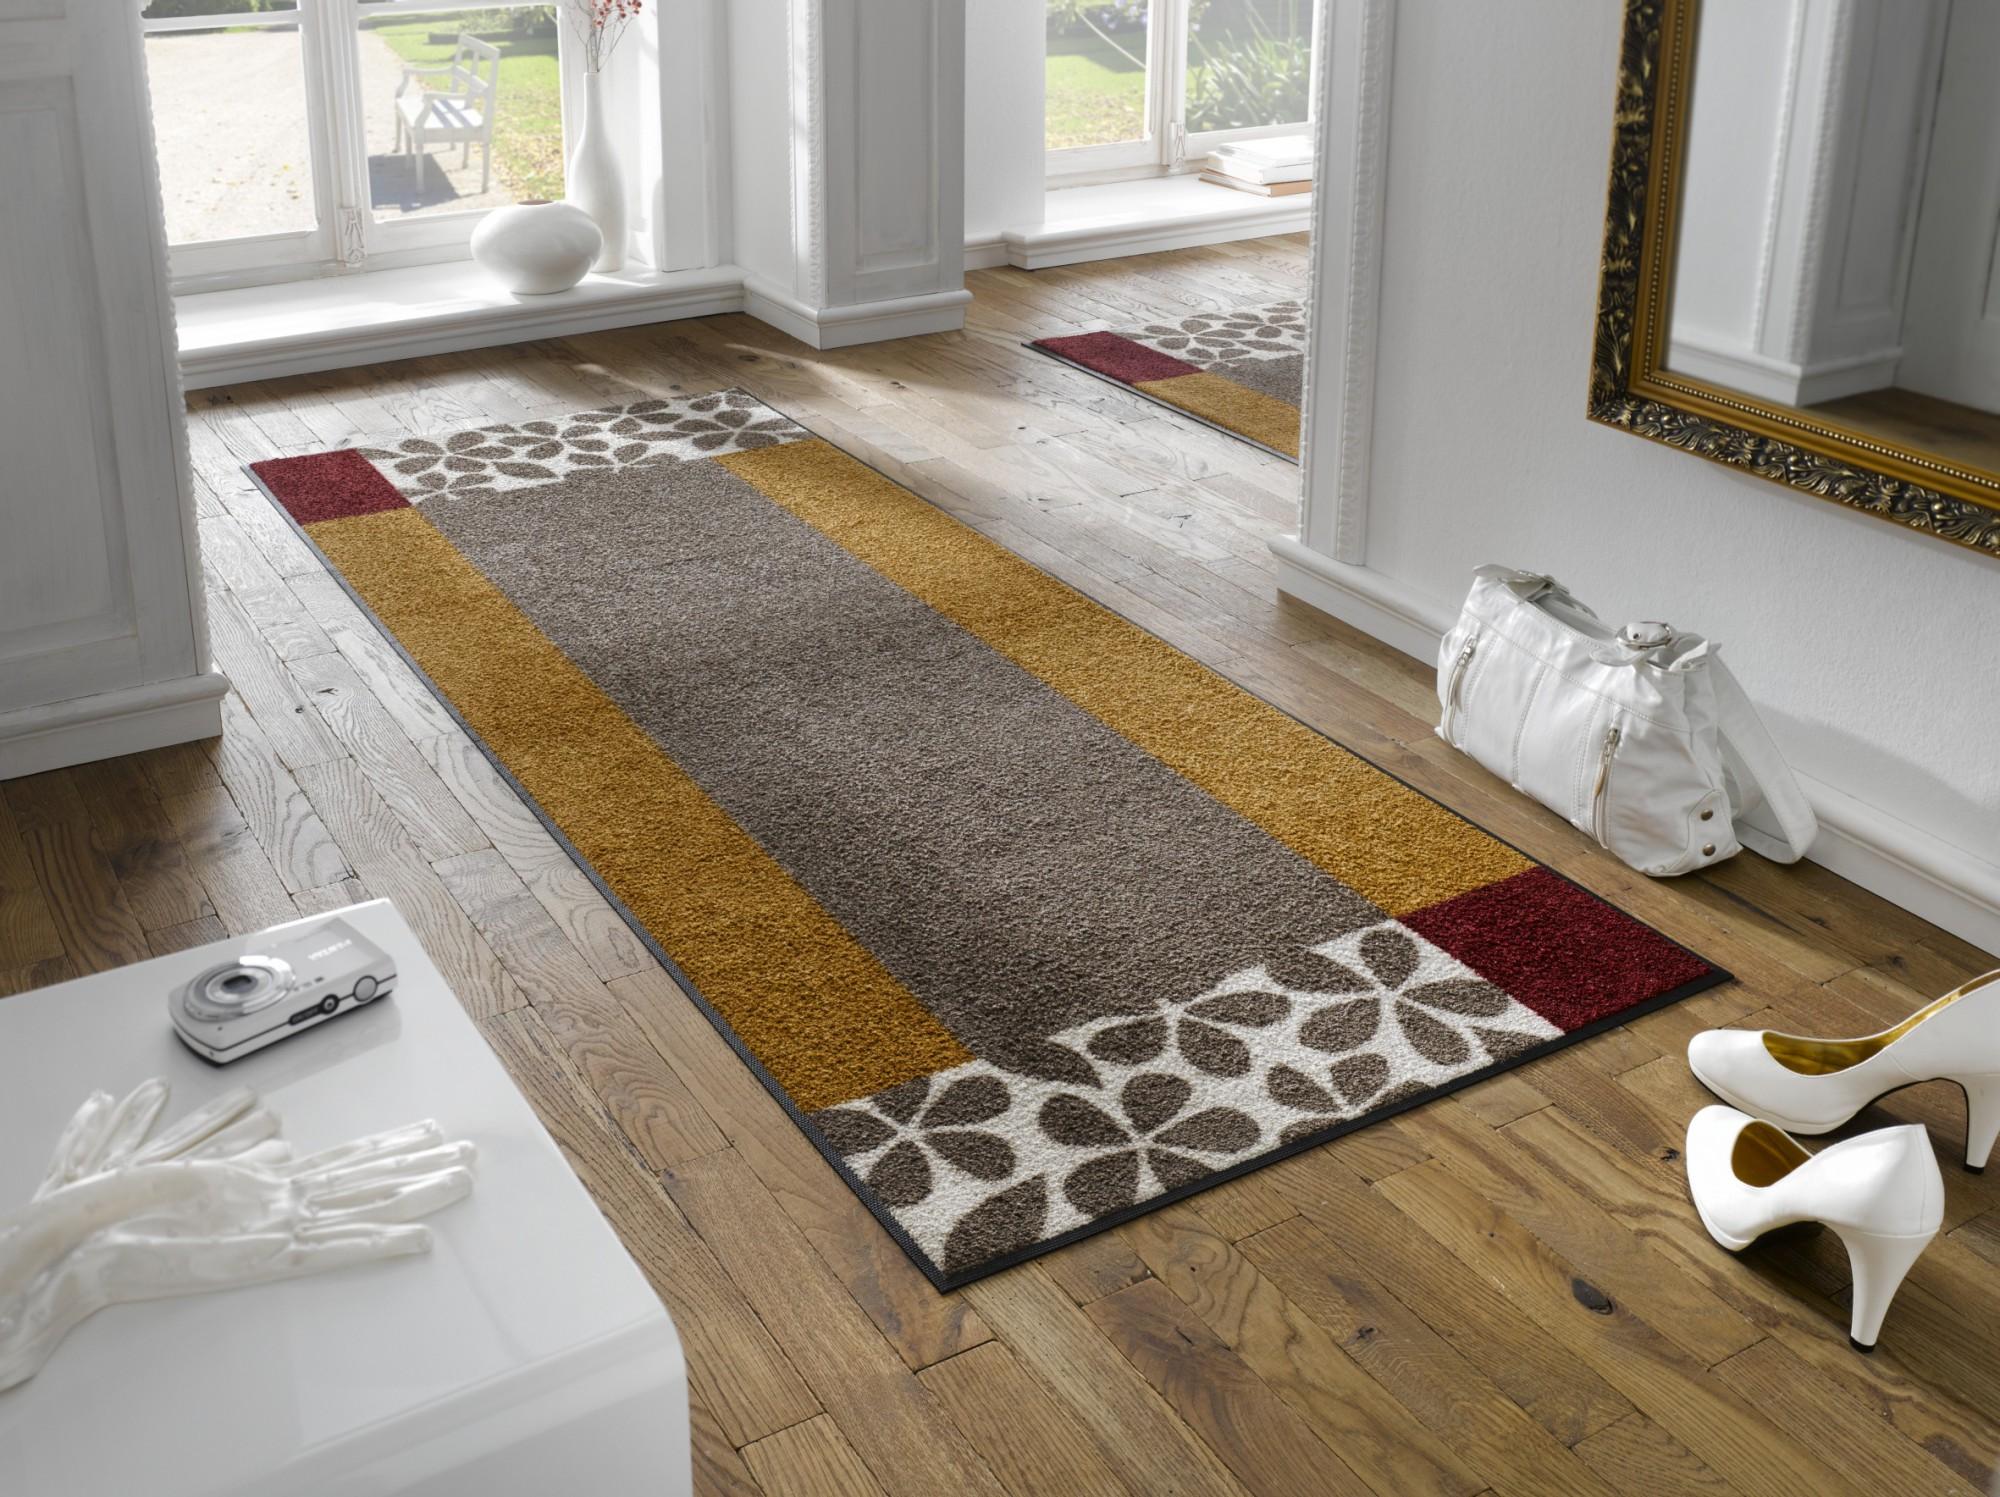 florita waschbare fu matte wash dry ebay. Black Bedroom Furniture Sets. Home Design Ideas